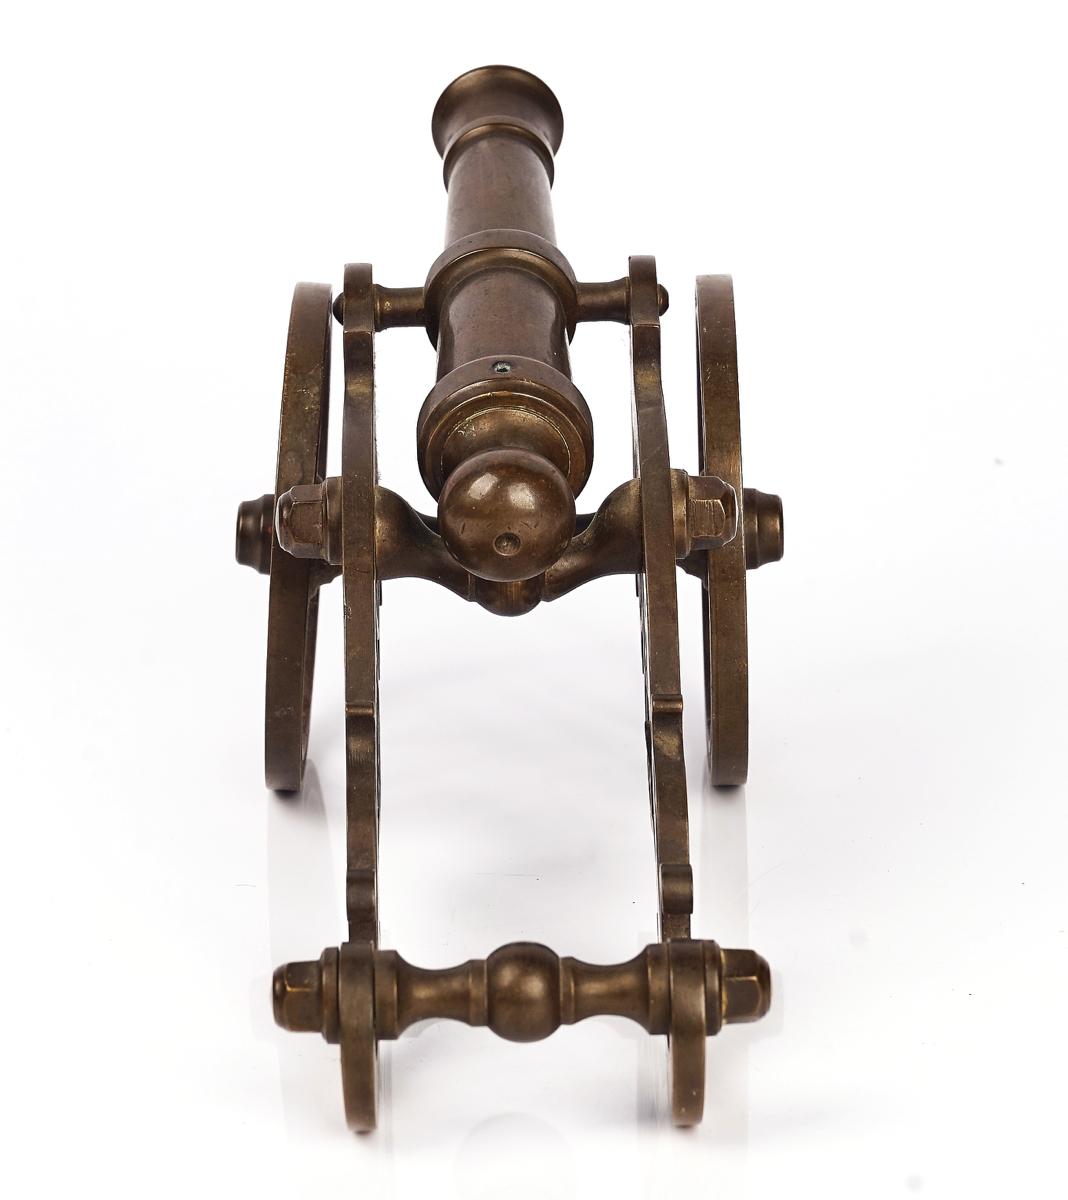 A BRASS MODEL OF A FIELD GUN - Image 5 of 7